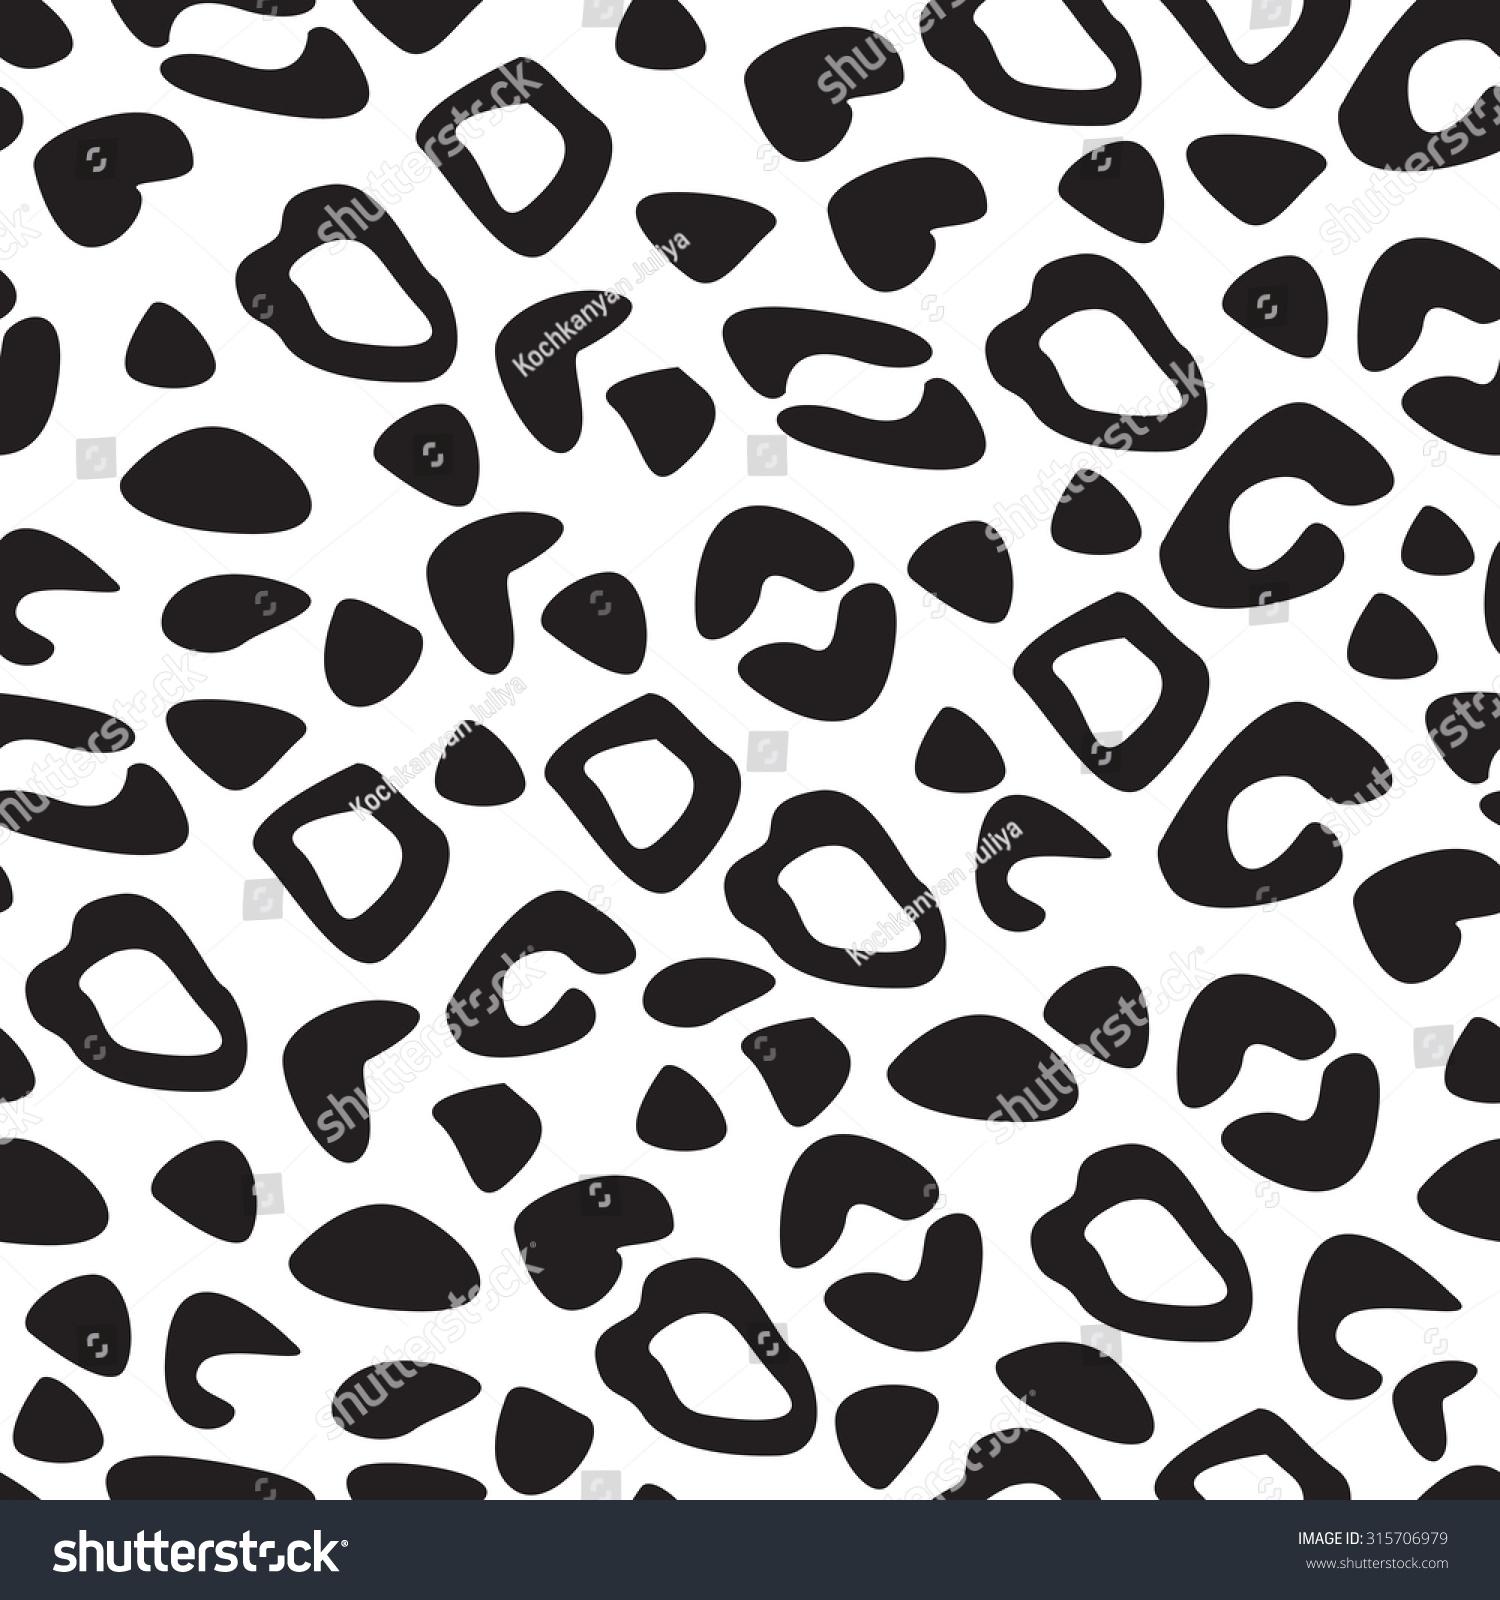 animal print seamless pattern - photo #11